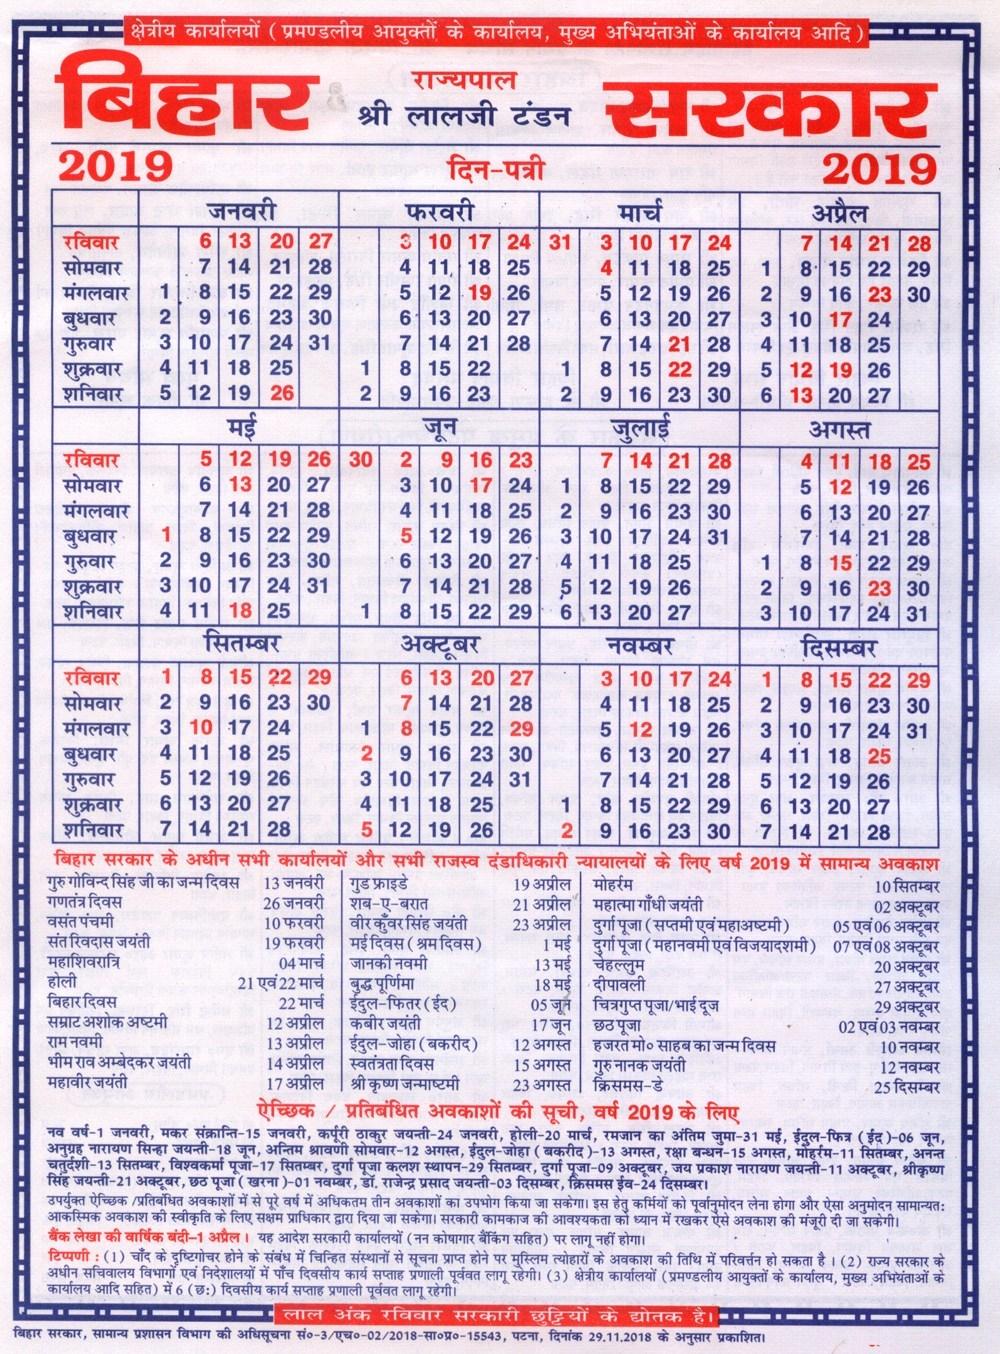 Bihar_Government_Calendar2019 | Bihar School inside Bihar Govt 2020 Calendar